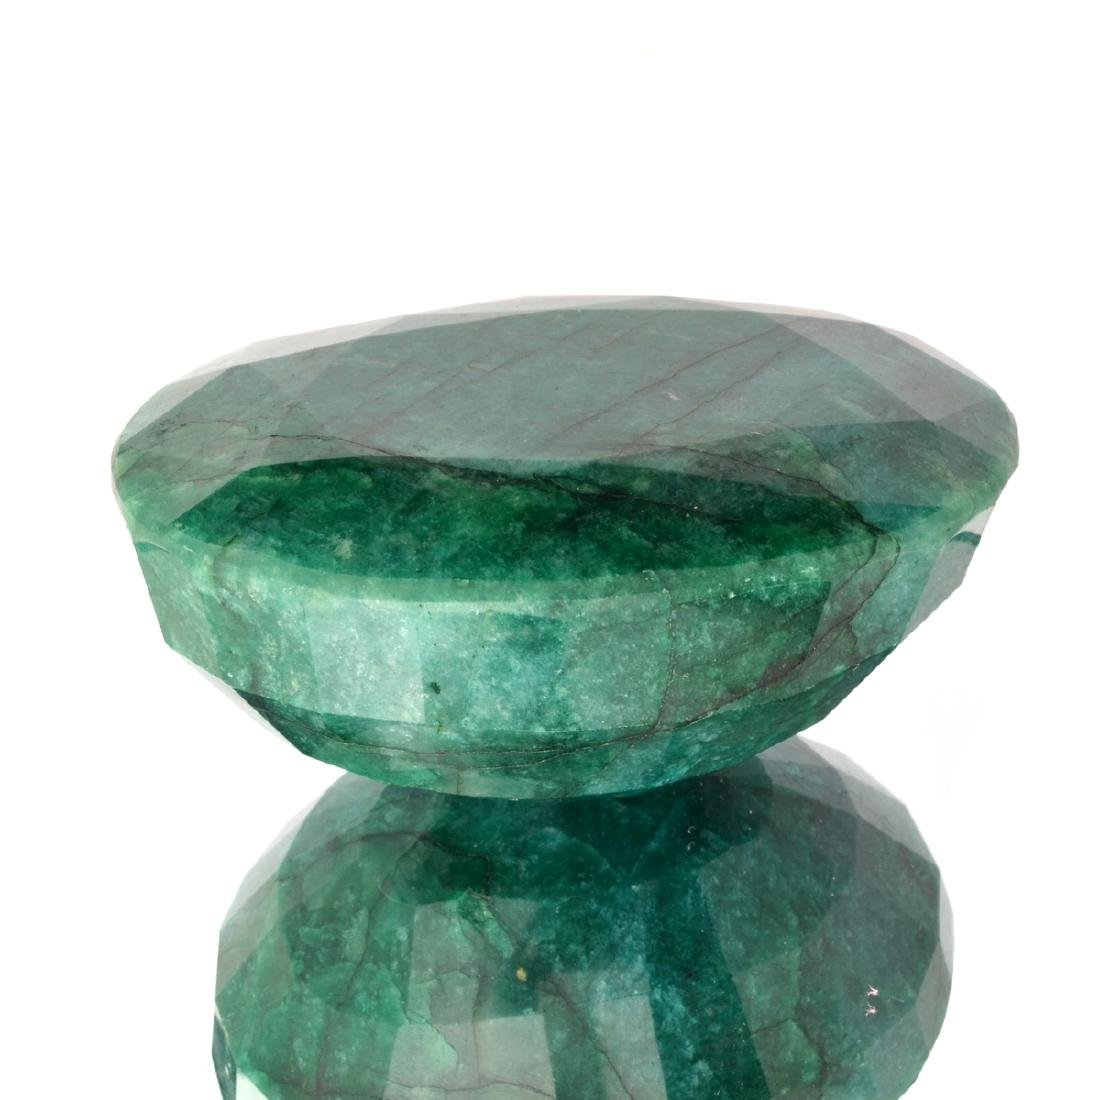 Est. Value 4.2K - 7.0K 1755.50CT Oval Cut Green Beryl